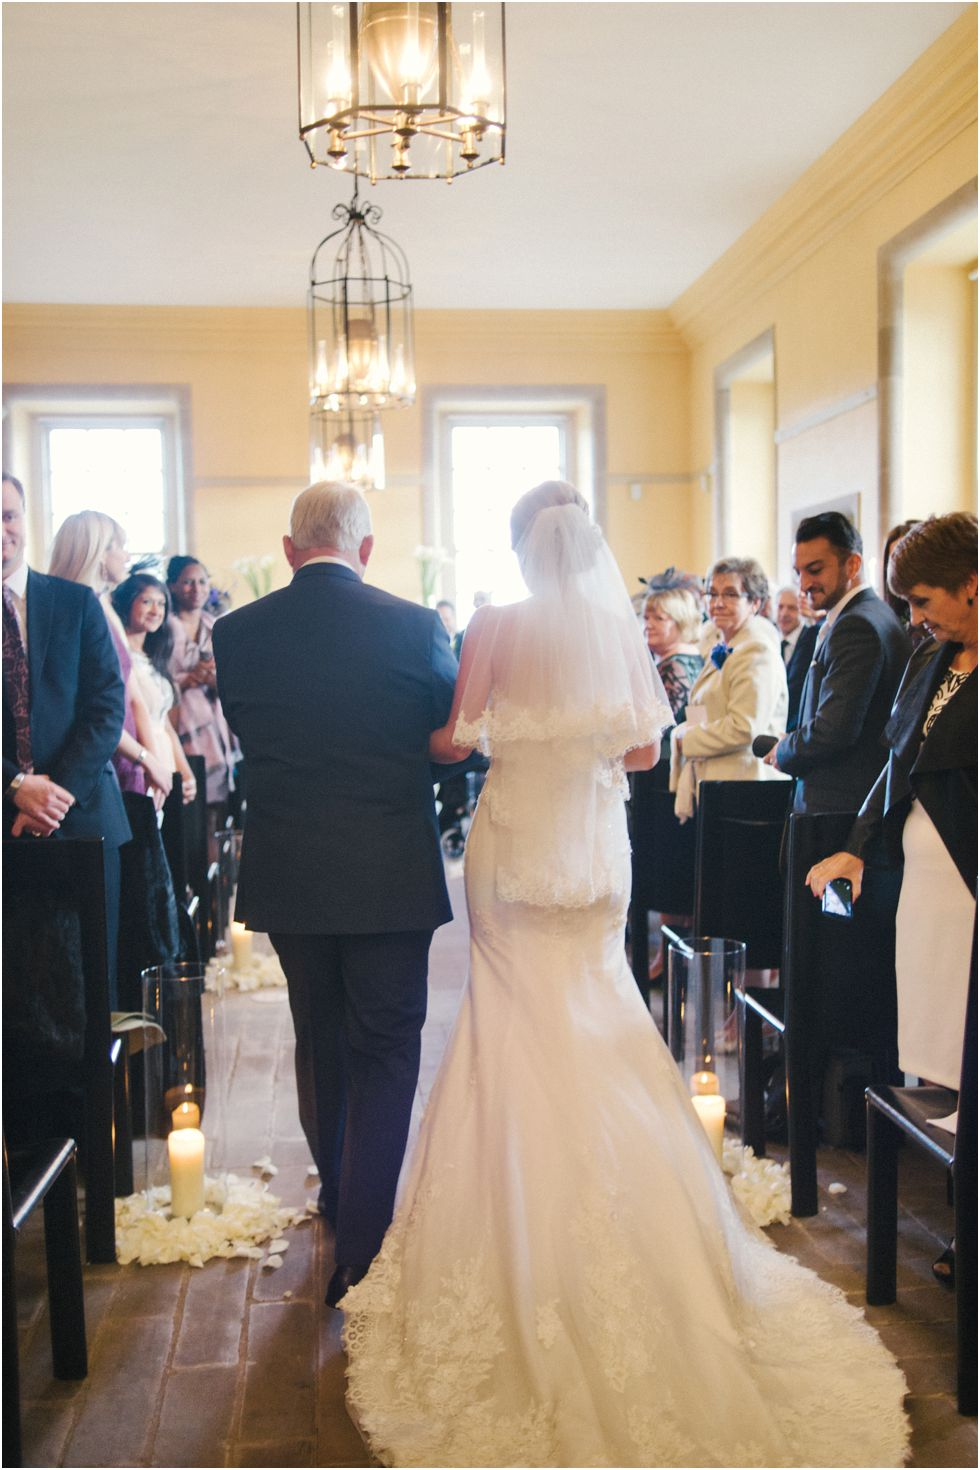 Hopetoun-House-wedding-photography-Edinburgh-29.jpg